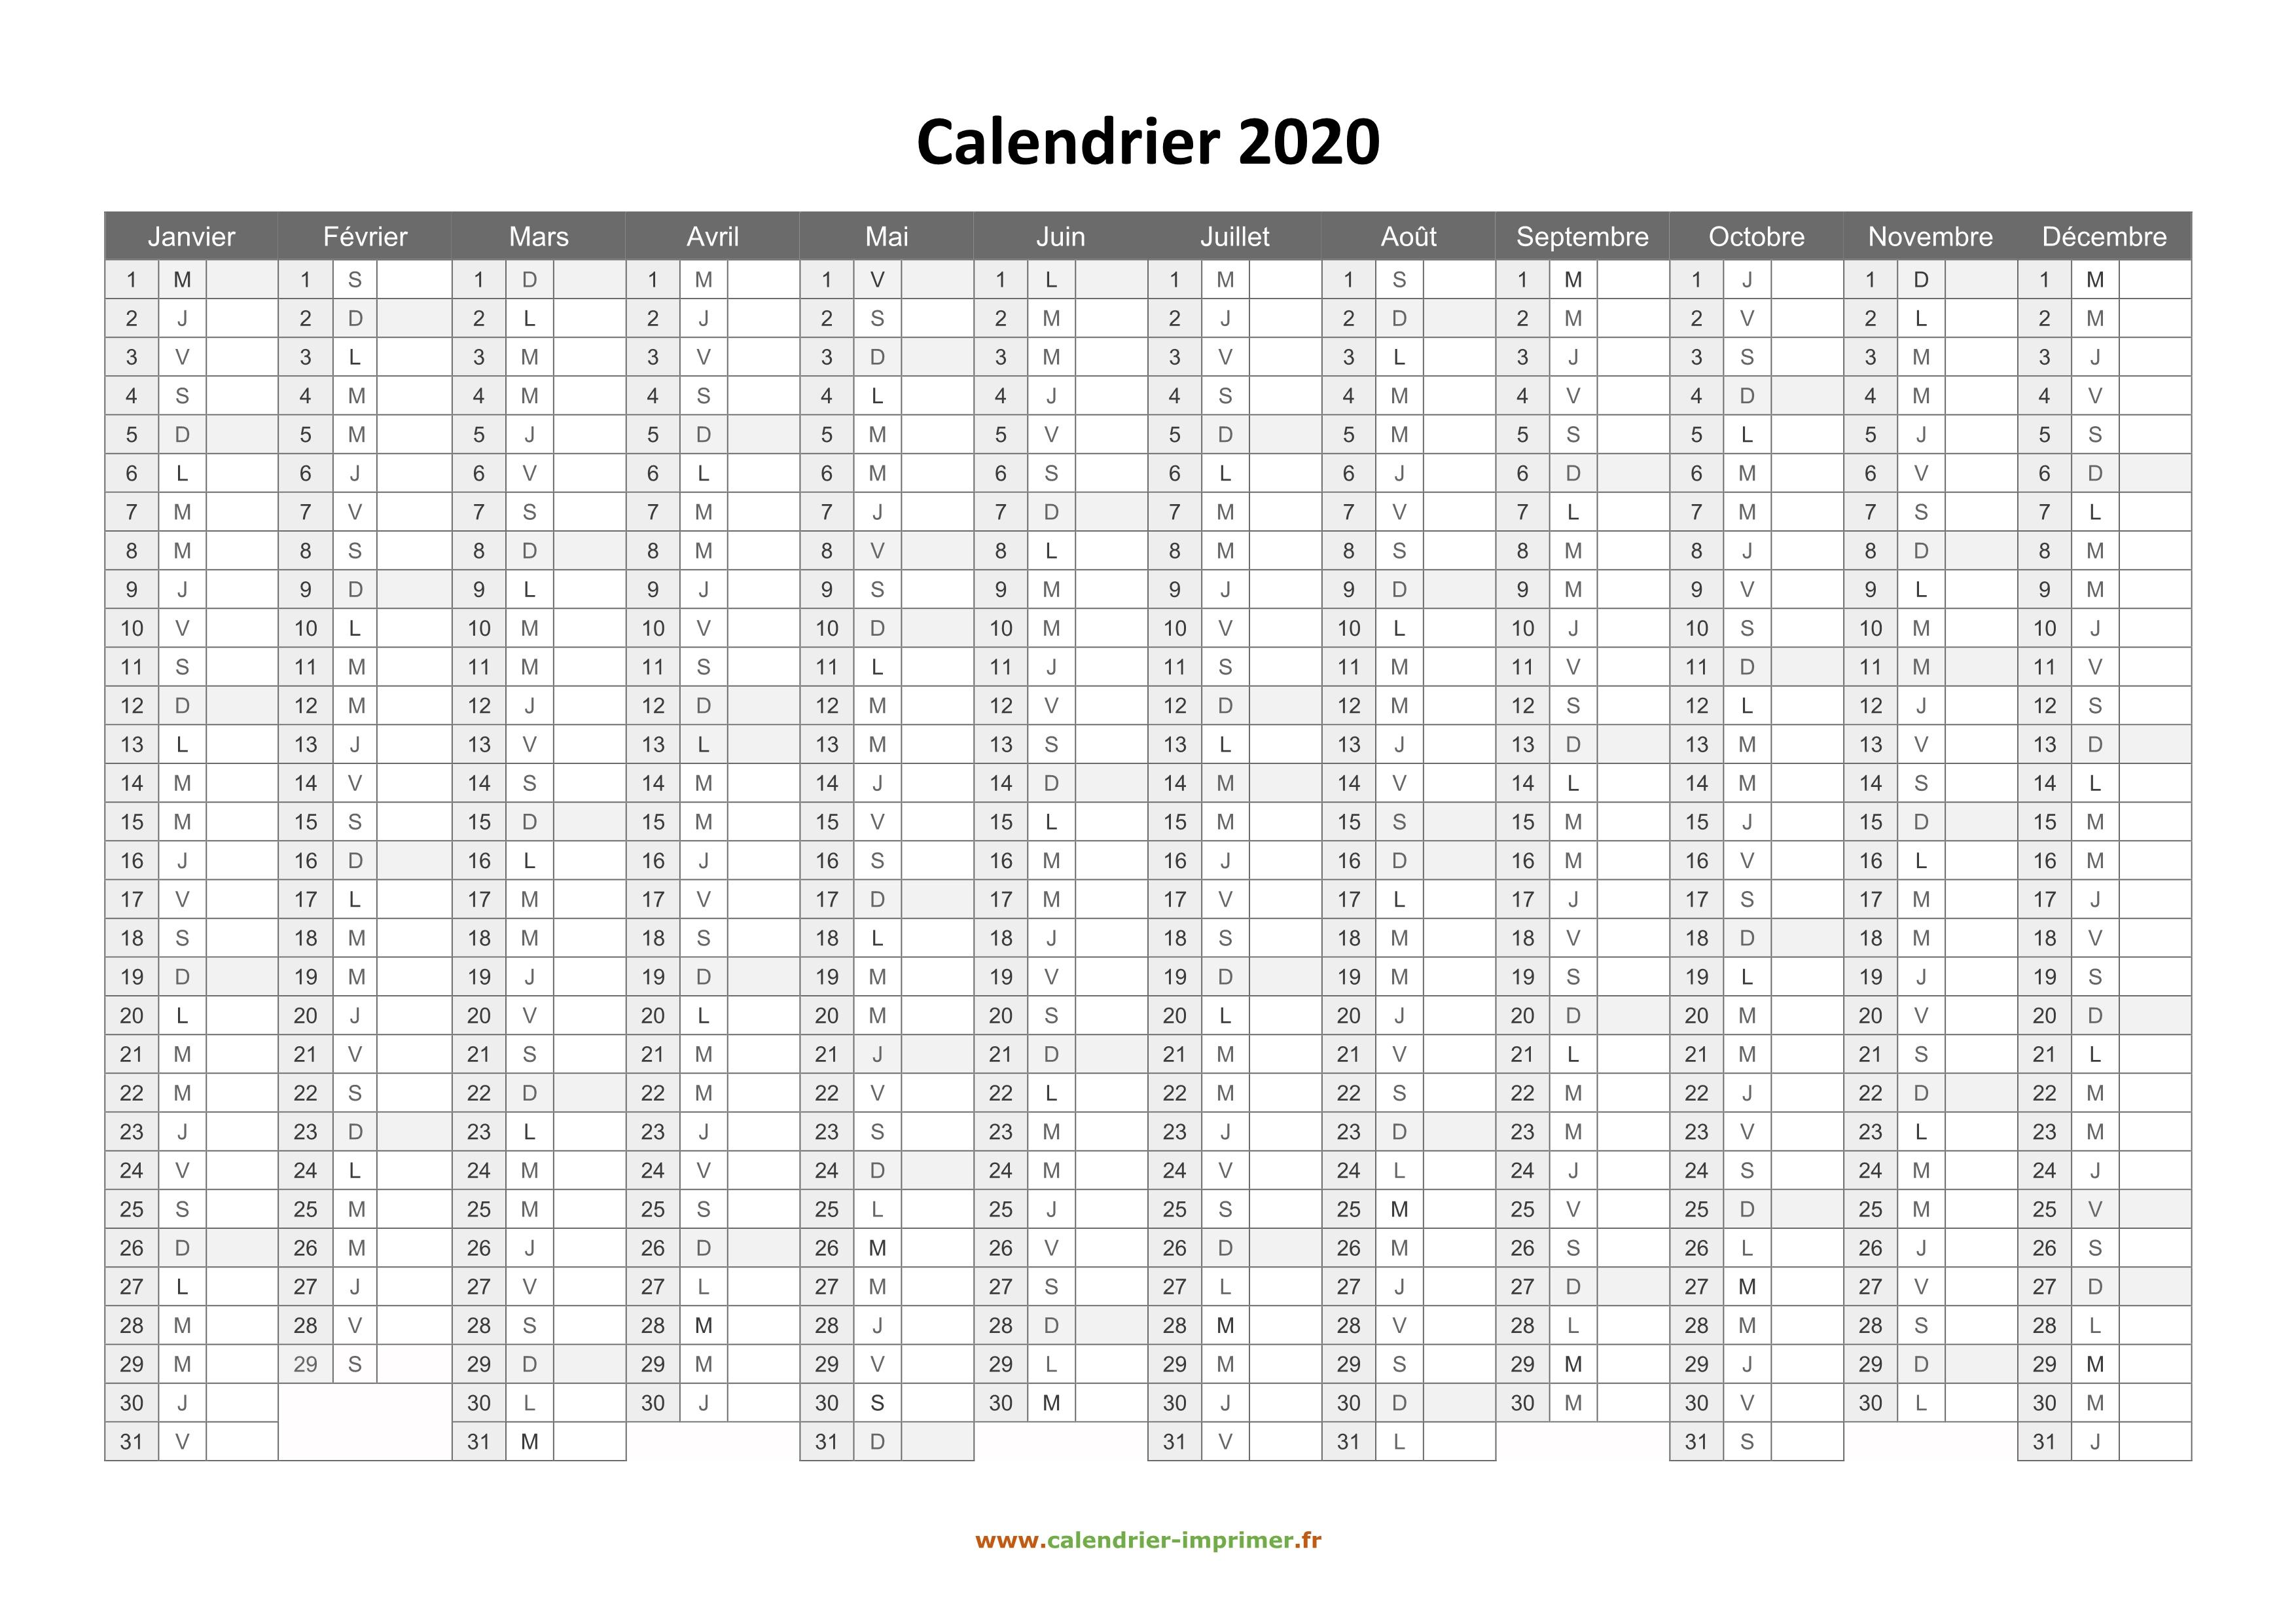 calendrier-annuel-2020-vierge